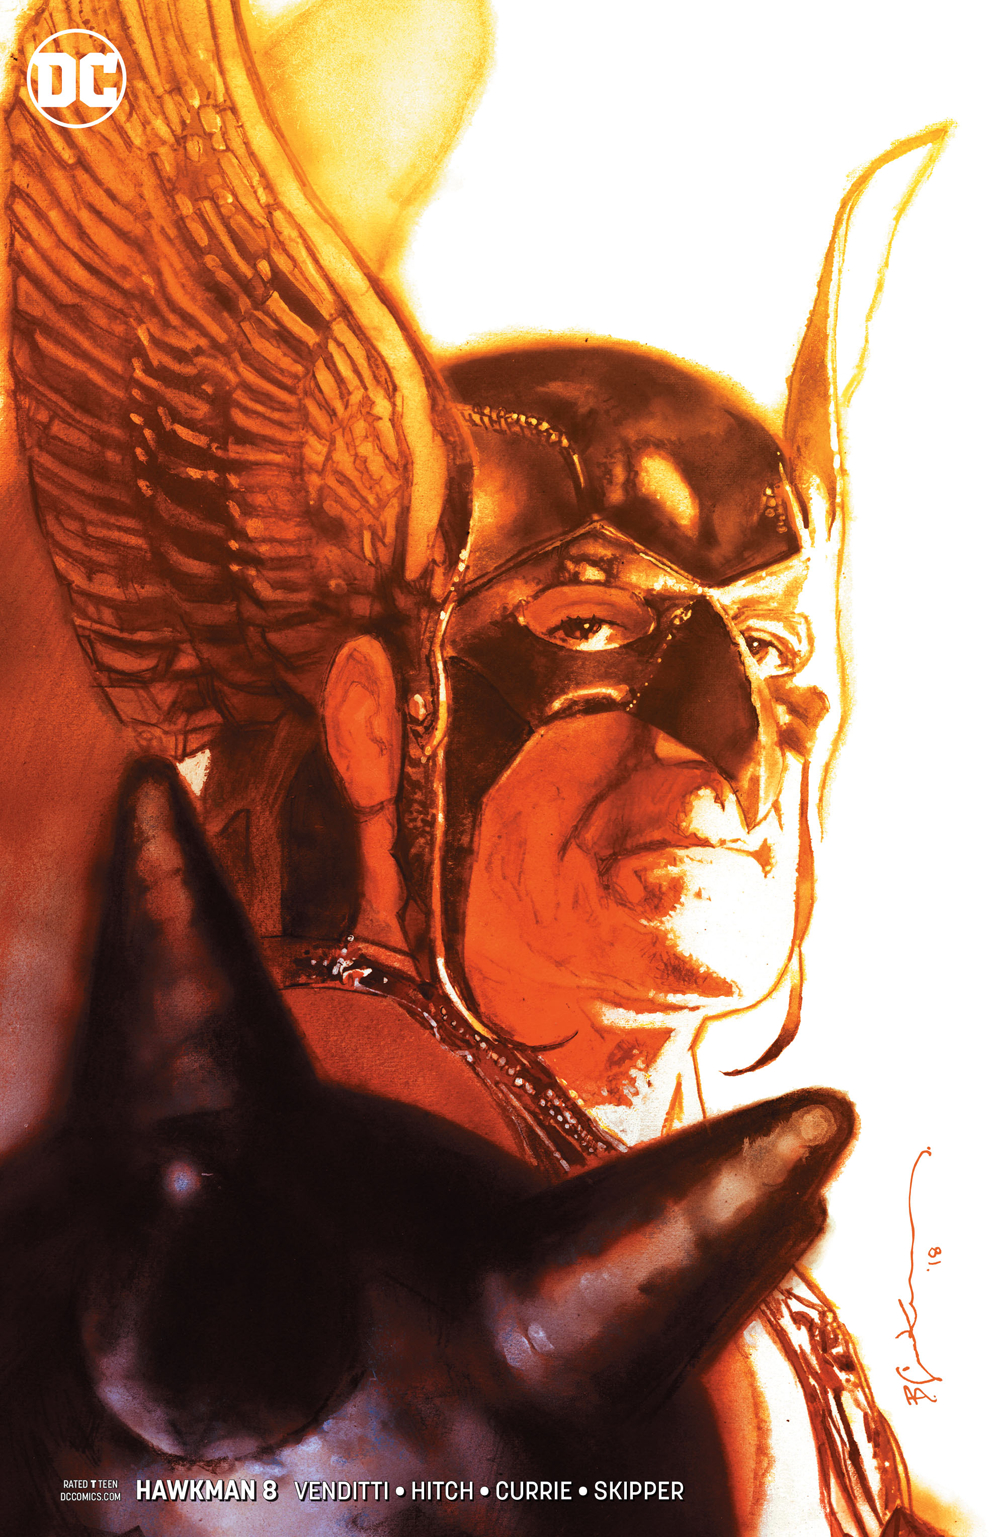 Hawkman #8  variant cover by Bill Sienkiewicz.